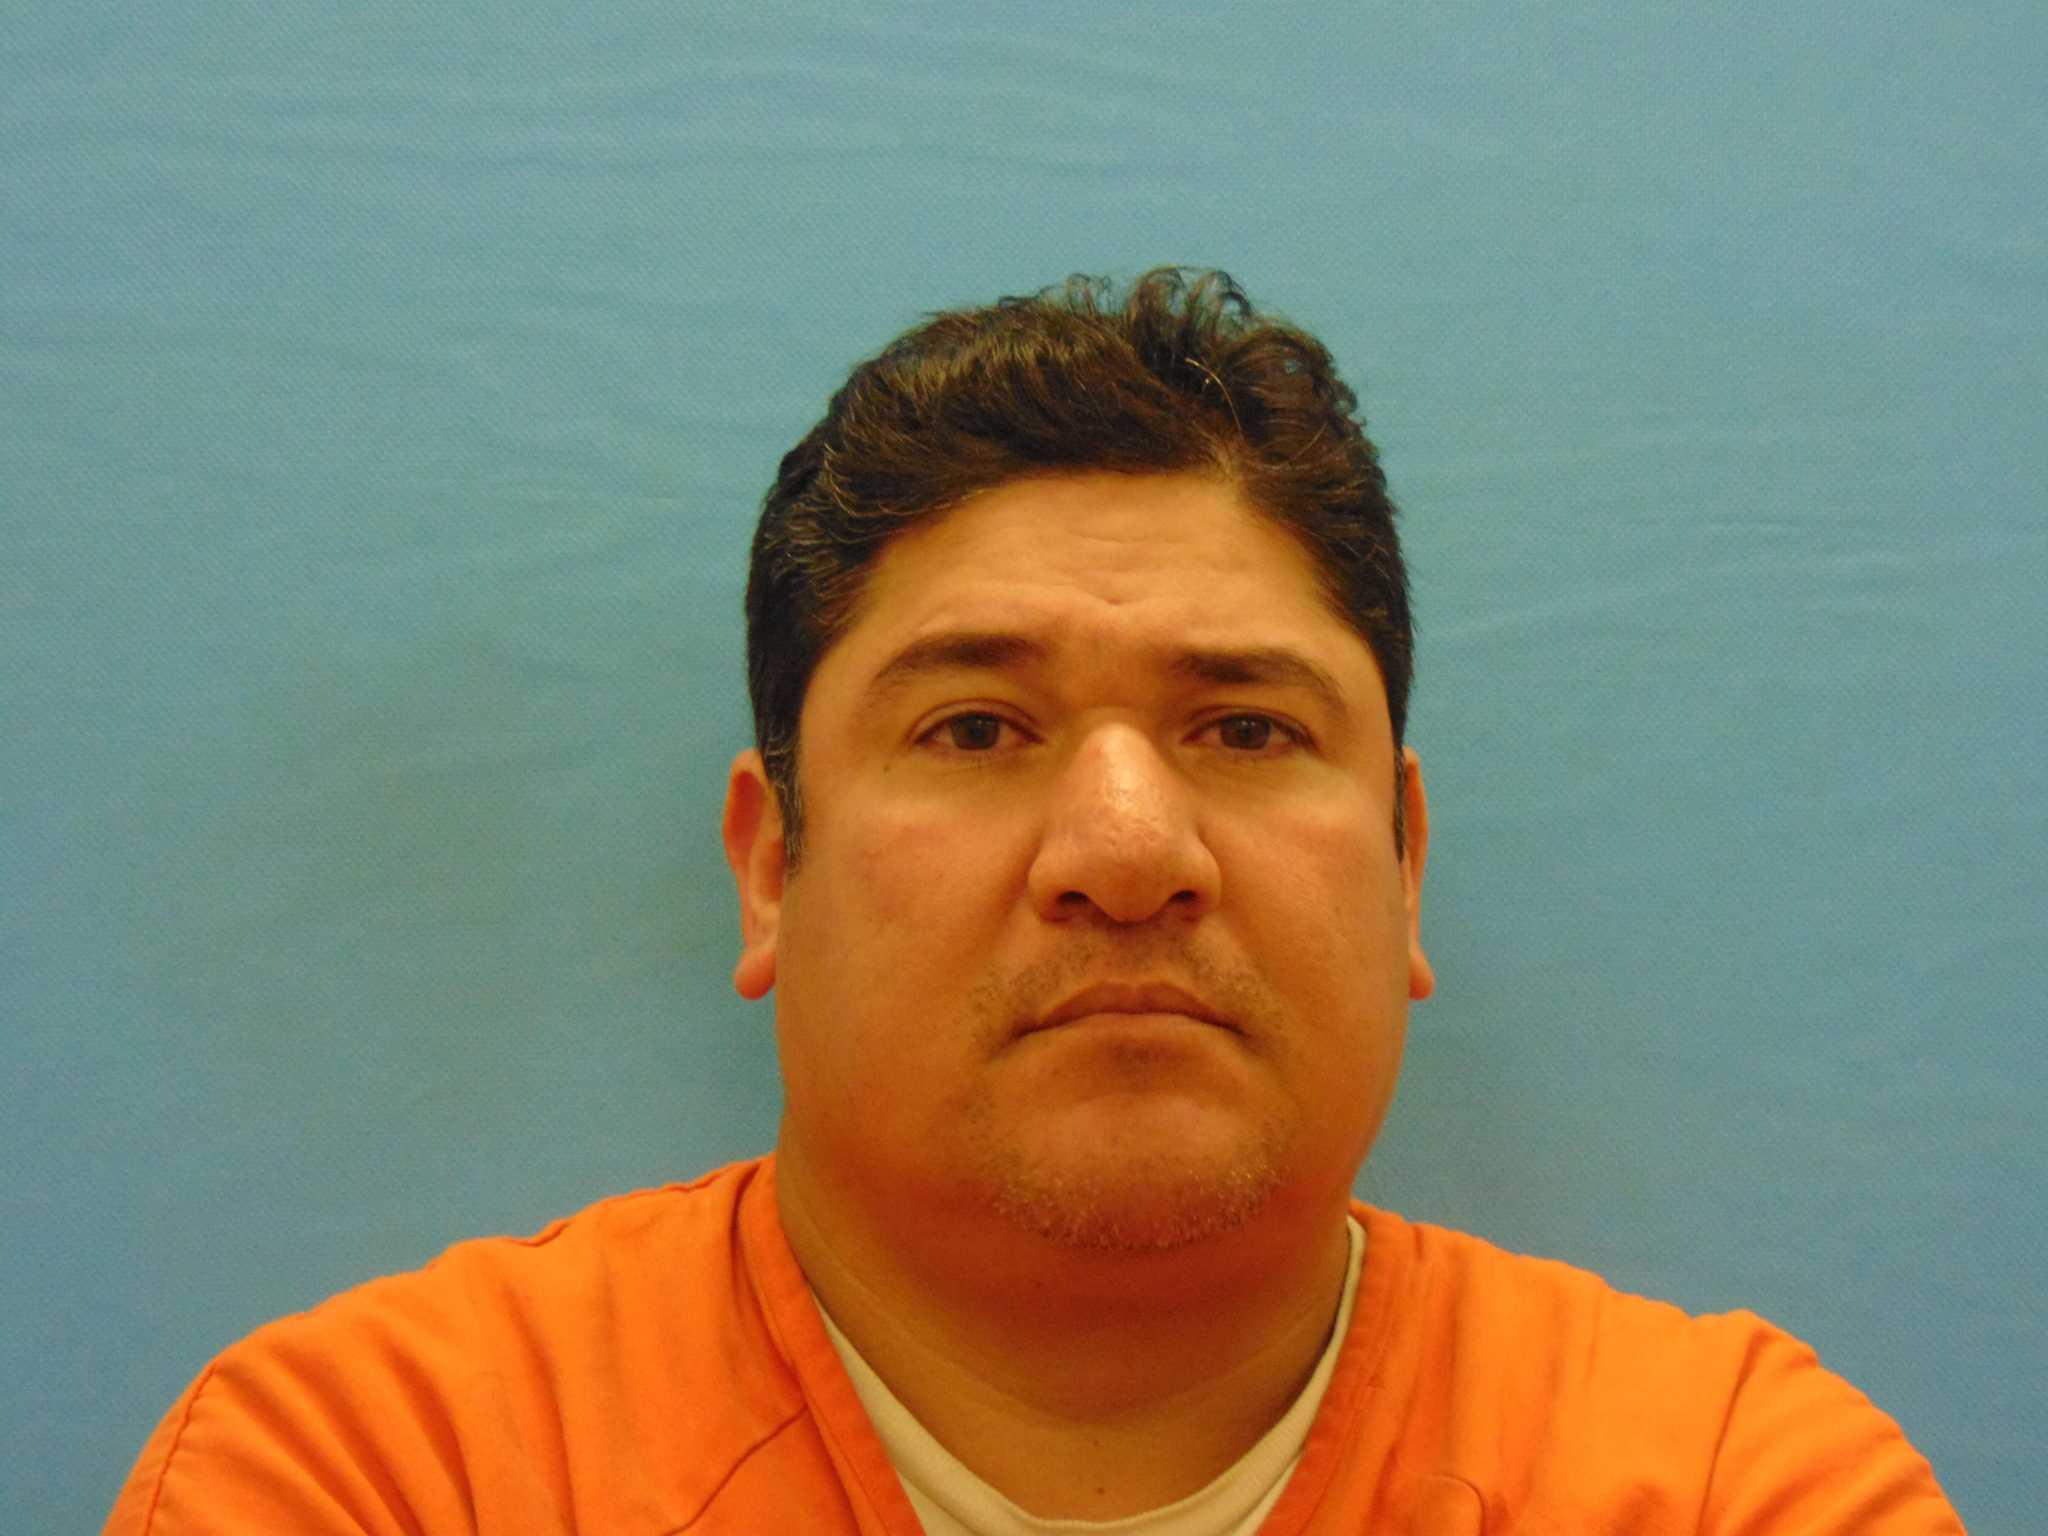 San Antonio Bandido who killed Hell's Angel member gets 18